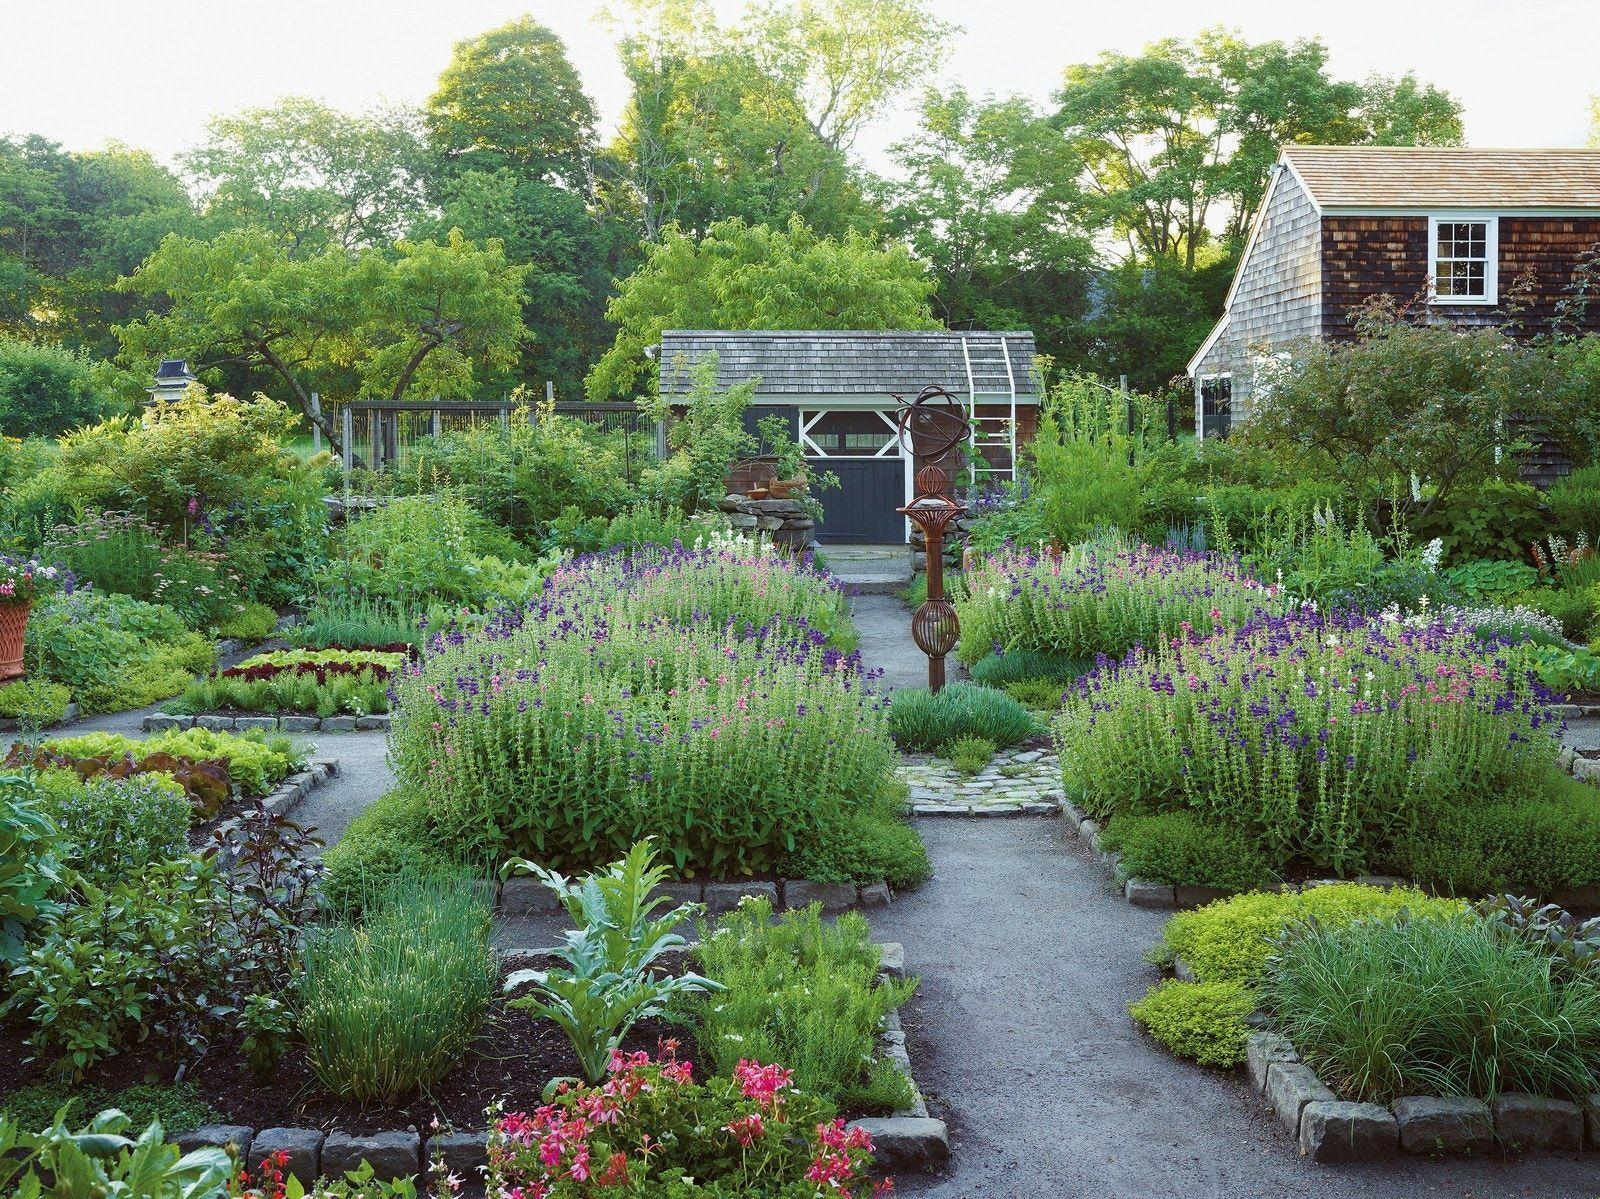 A New Book Examines Great American Gardens American Book Examines Gardens Great In 2020 Garden Design Landscape Design Amazing Gardens